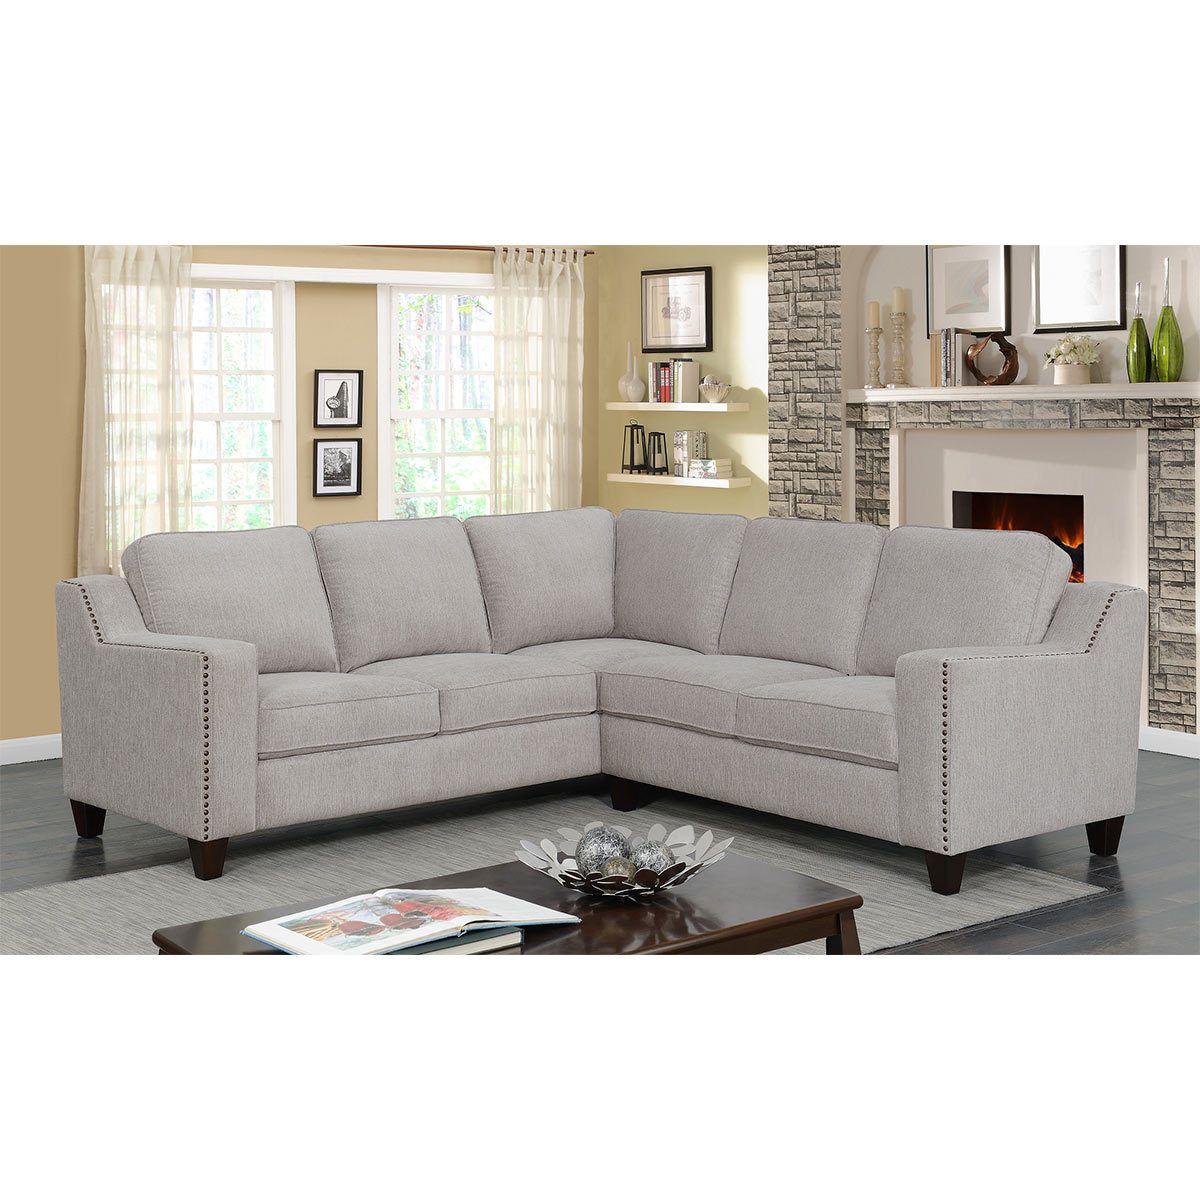 Mstar International Maddox Fabric Sectional Sofa | Home in ...